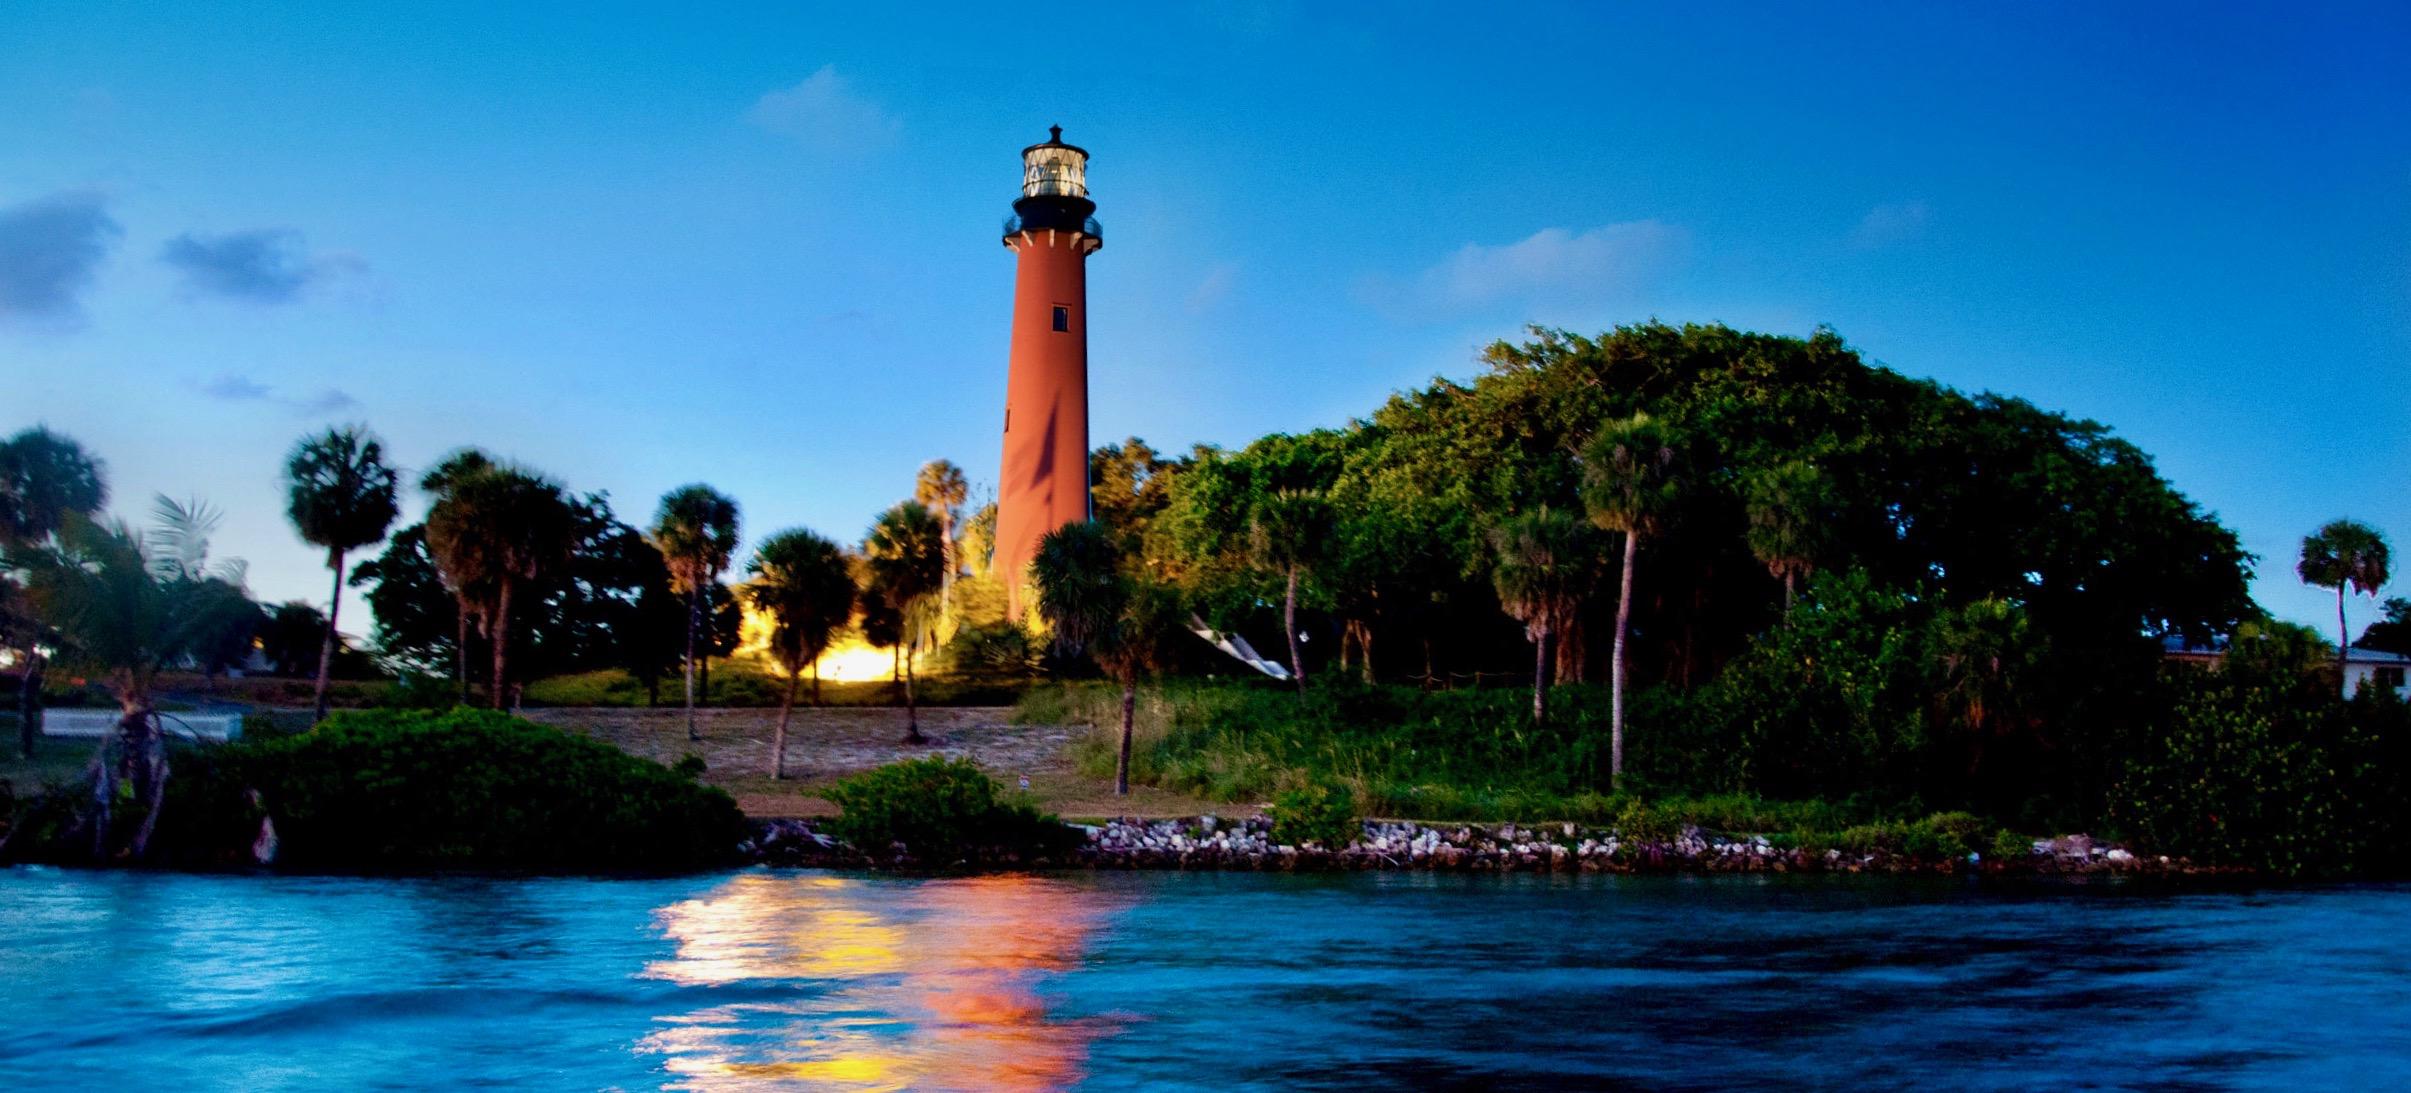 Sunset_lighthouse-1-large 2.jpg